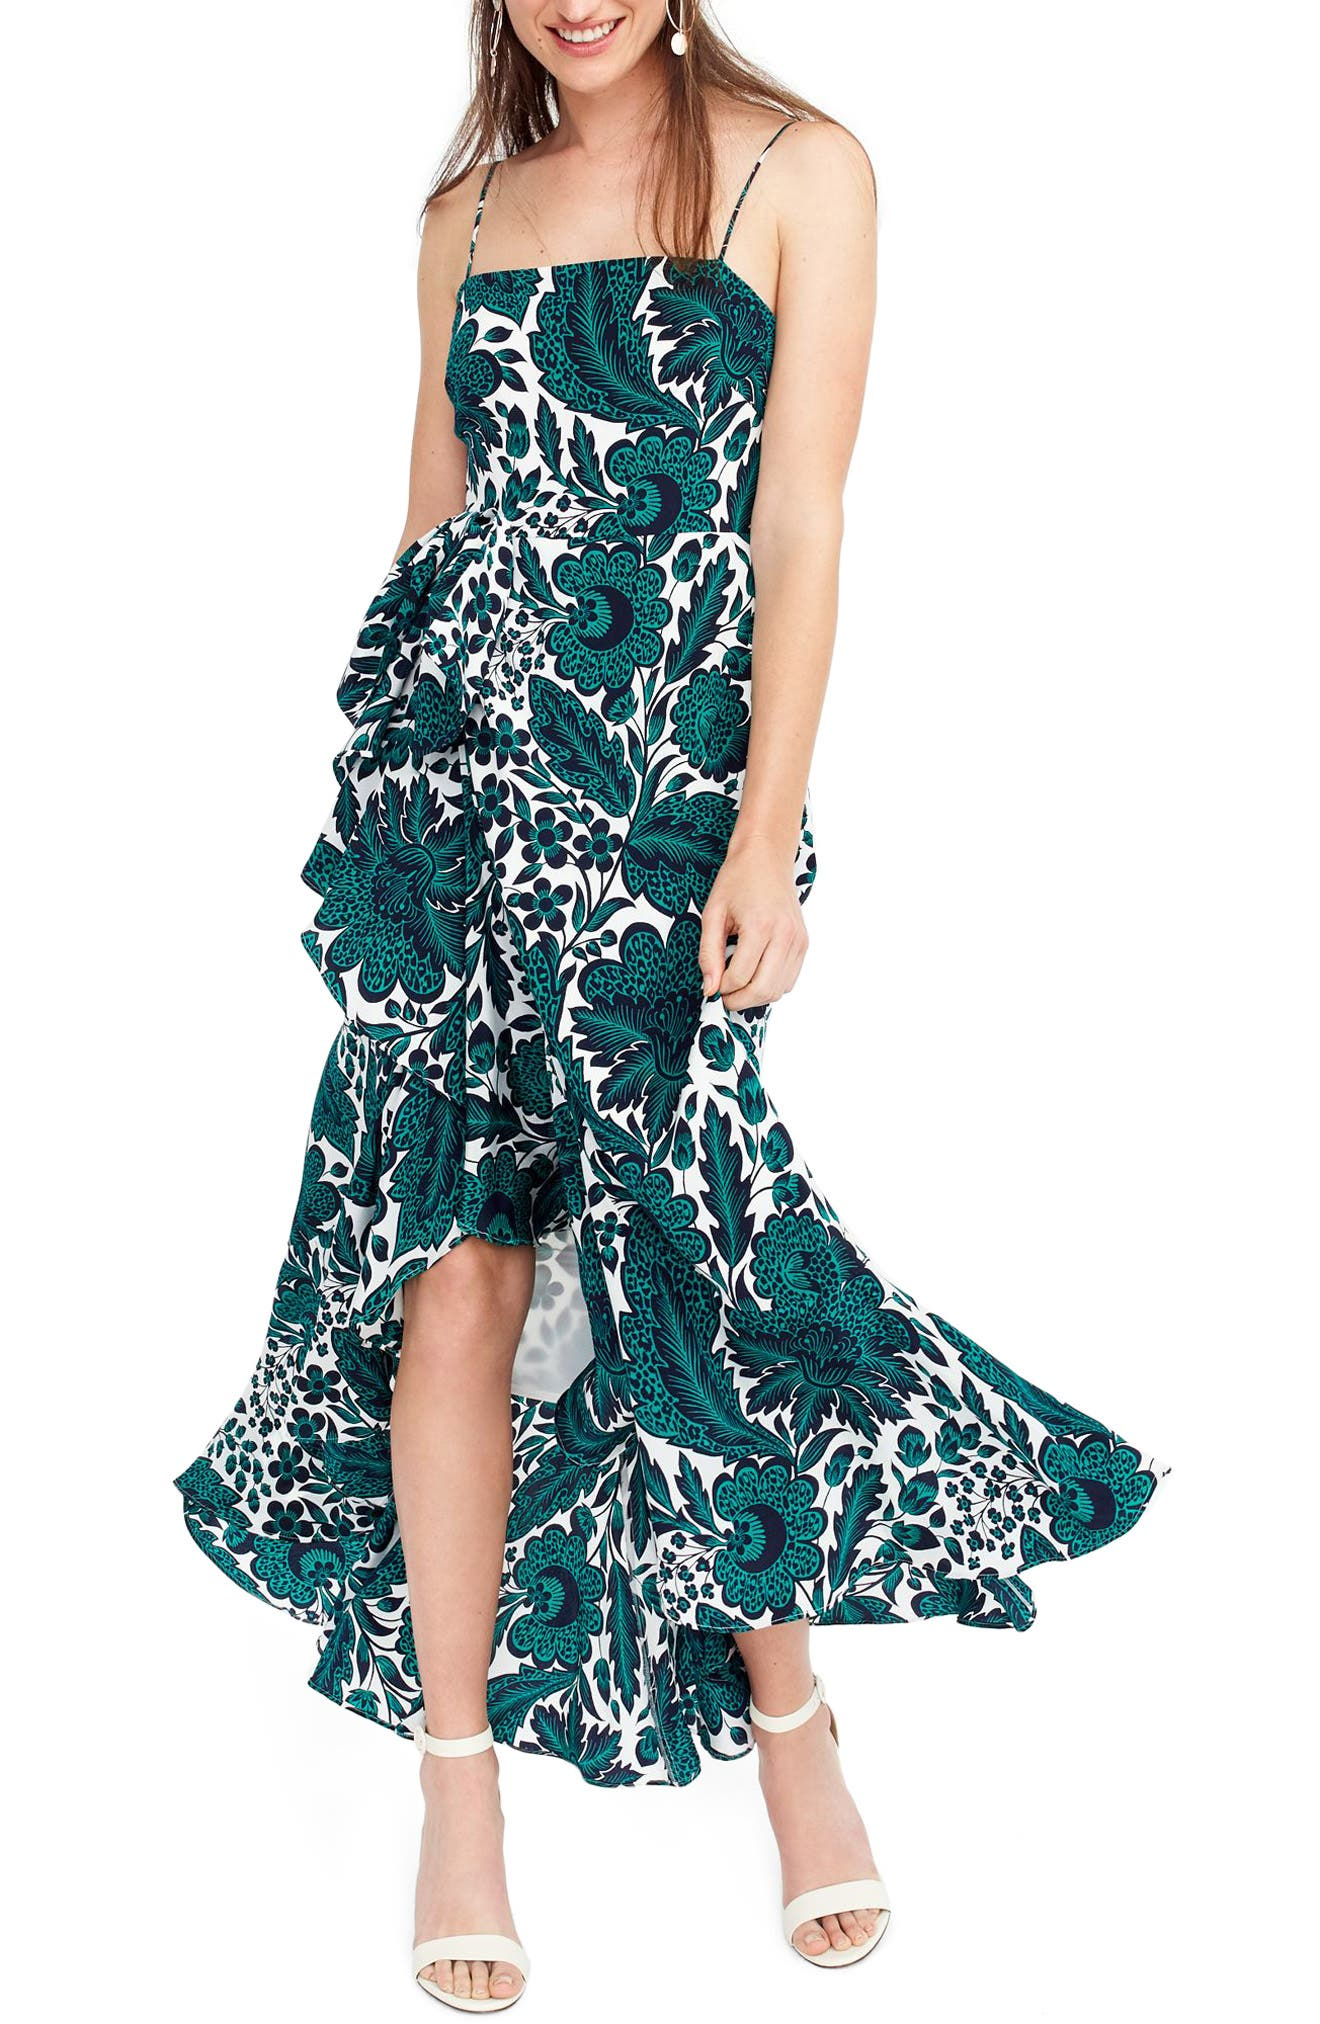 J.Crew Ruffle High/Low Silk Dress,                             Main thumbnail 1, color,                             Navy Green